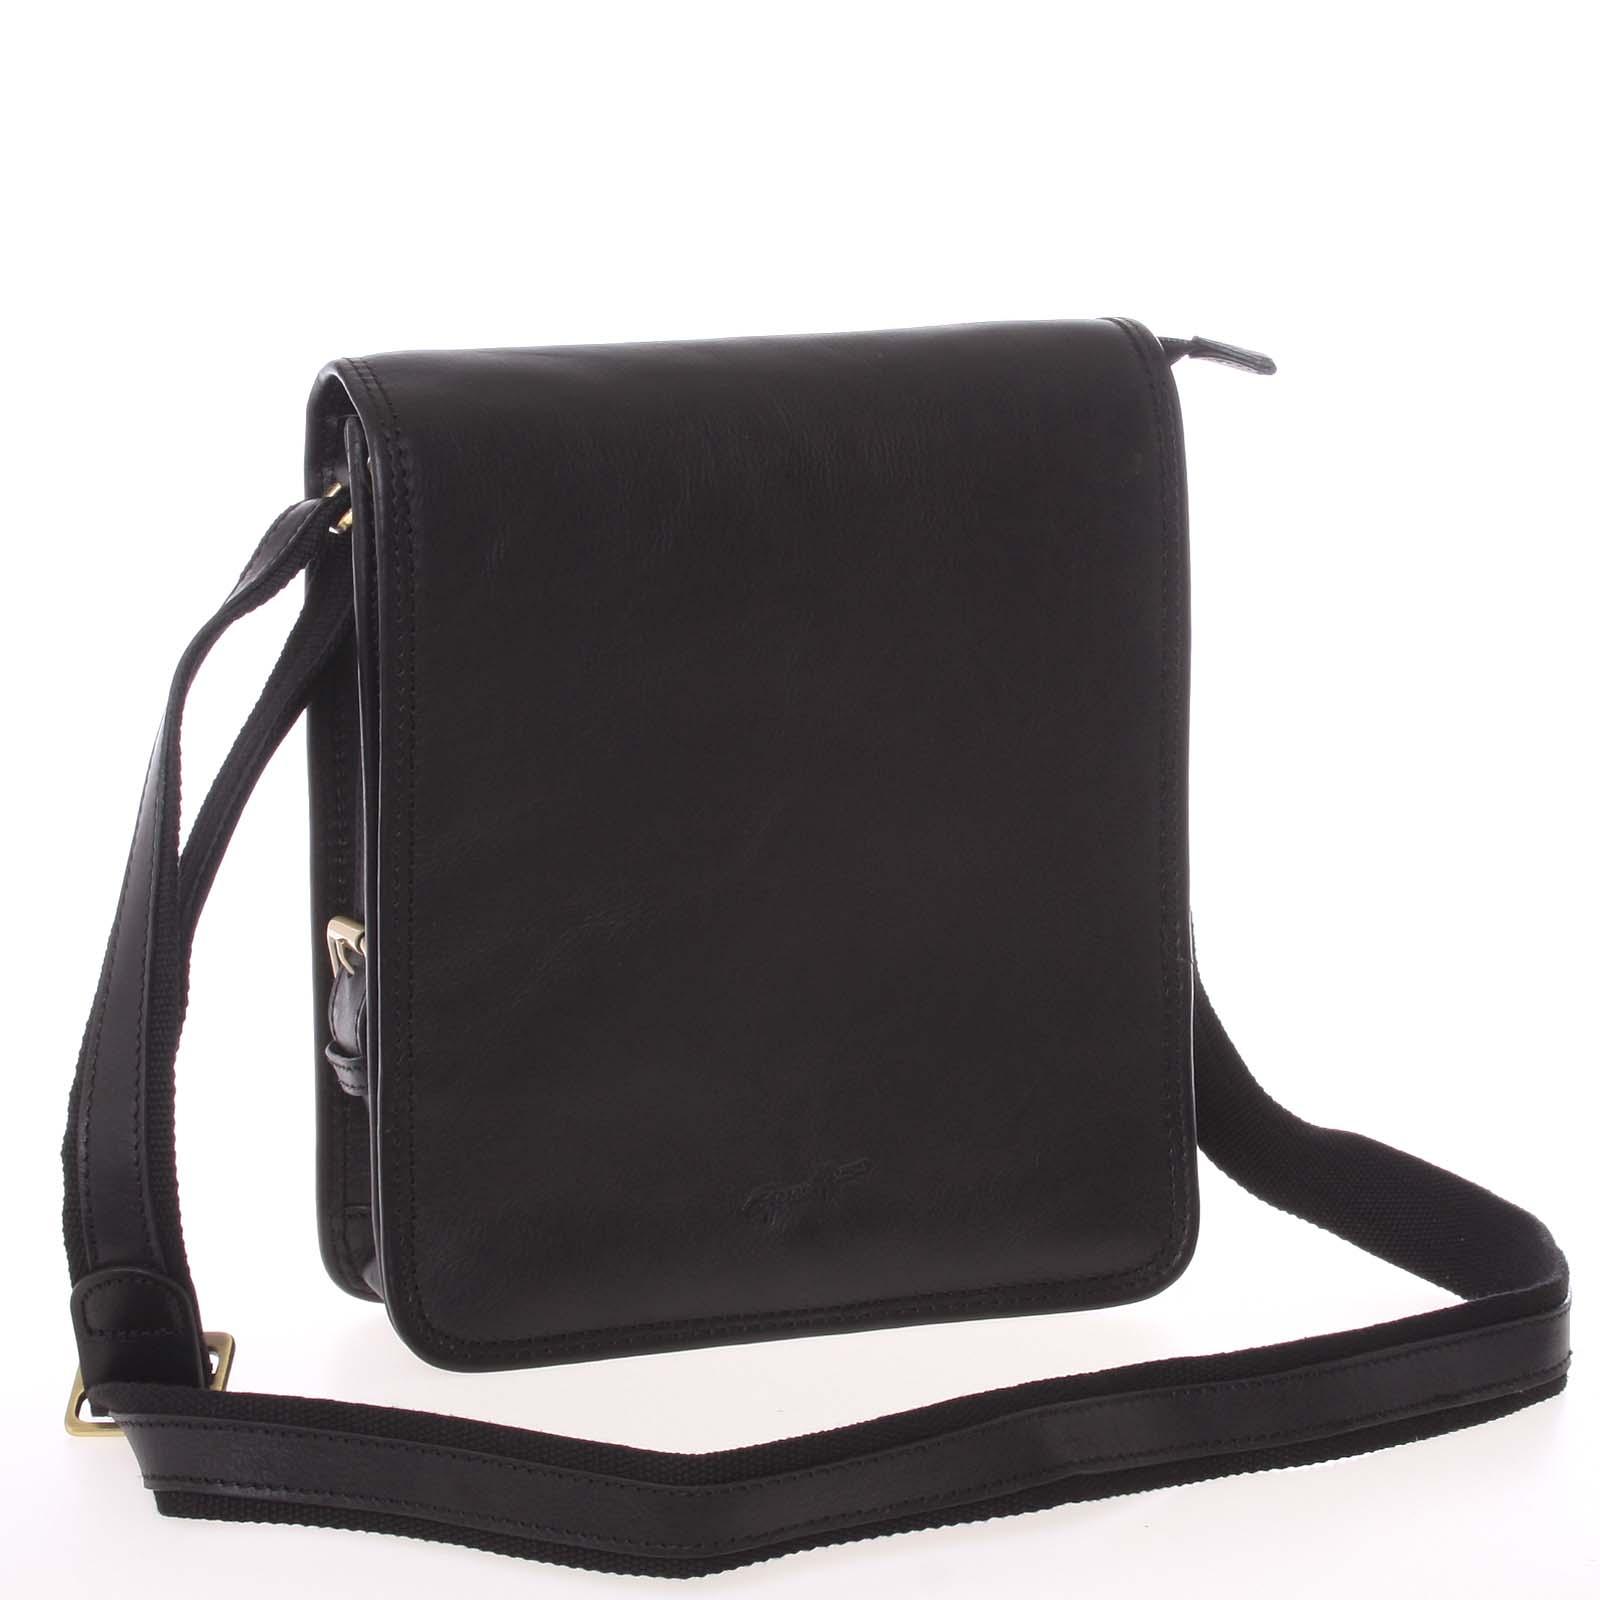 Pánská kožená taška přes rameno černá - Gerard Henon Bugros